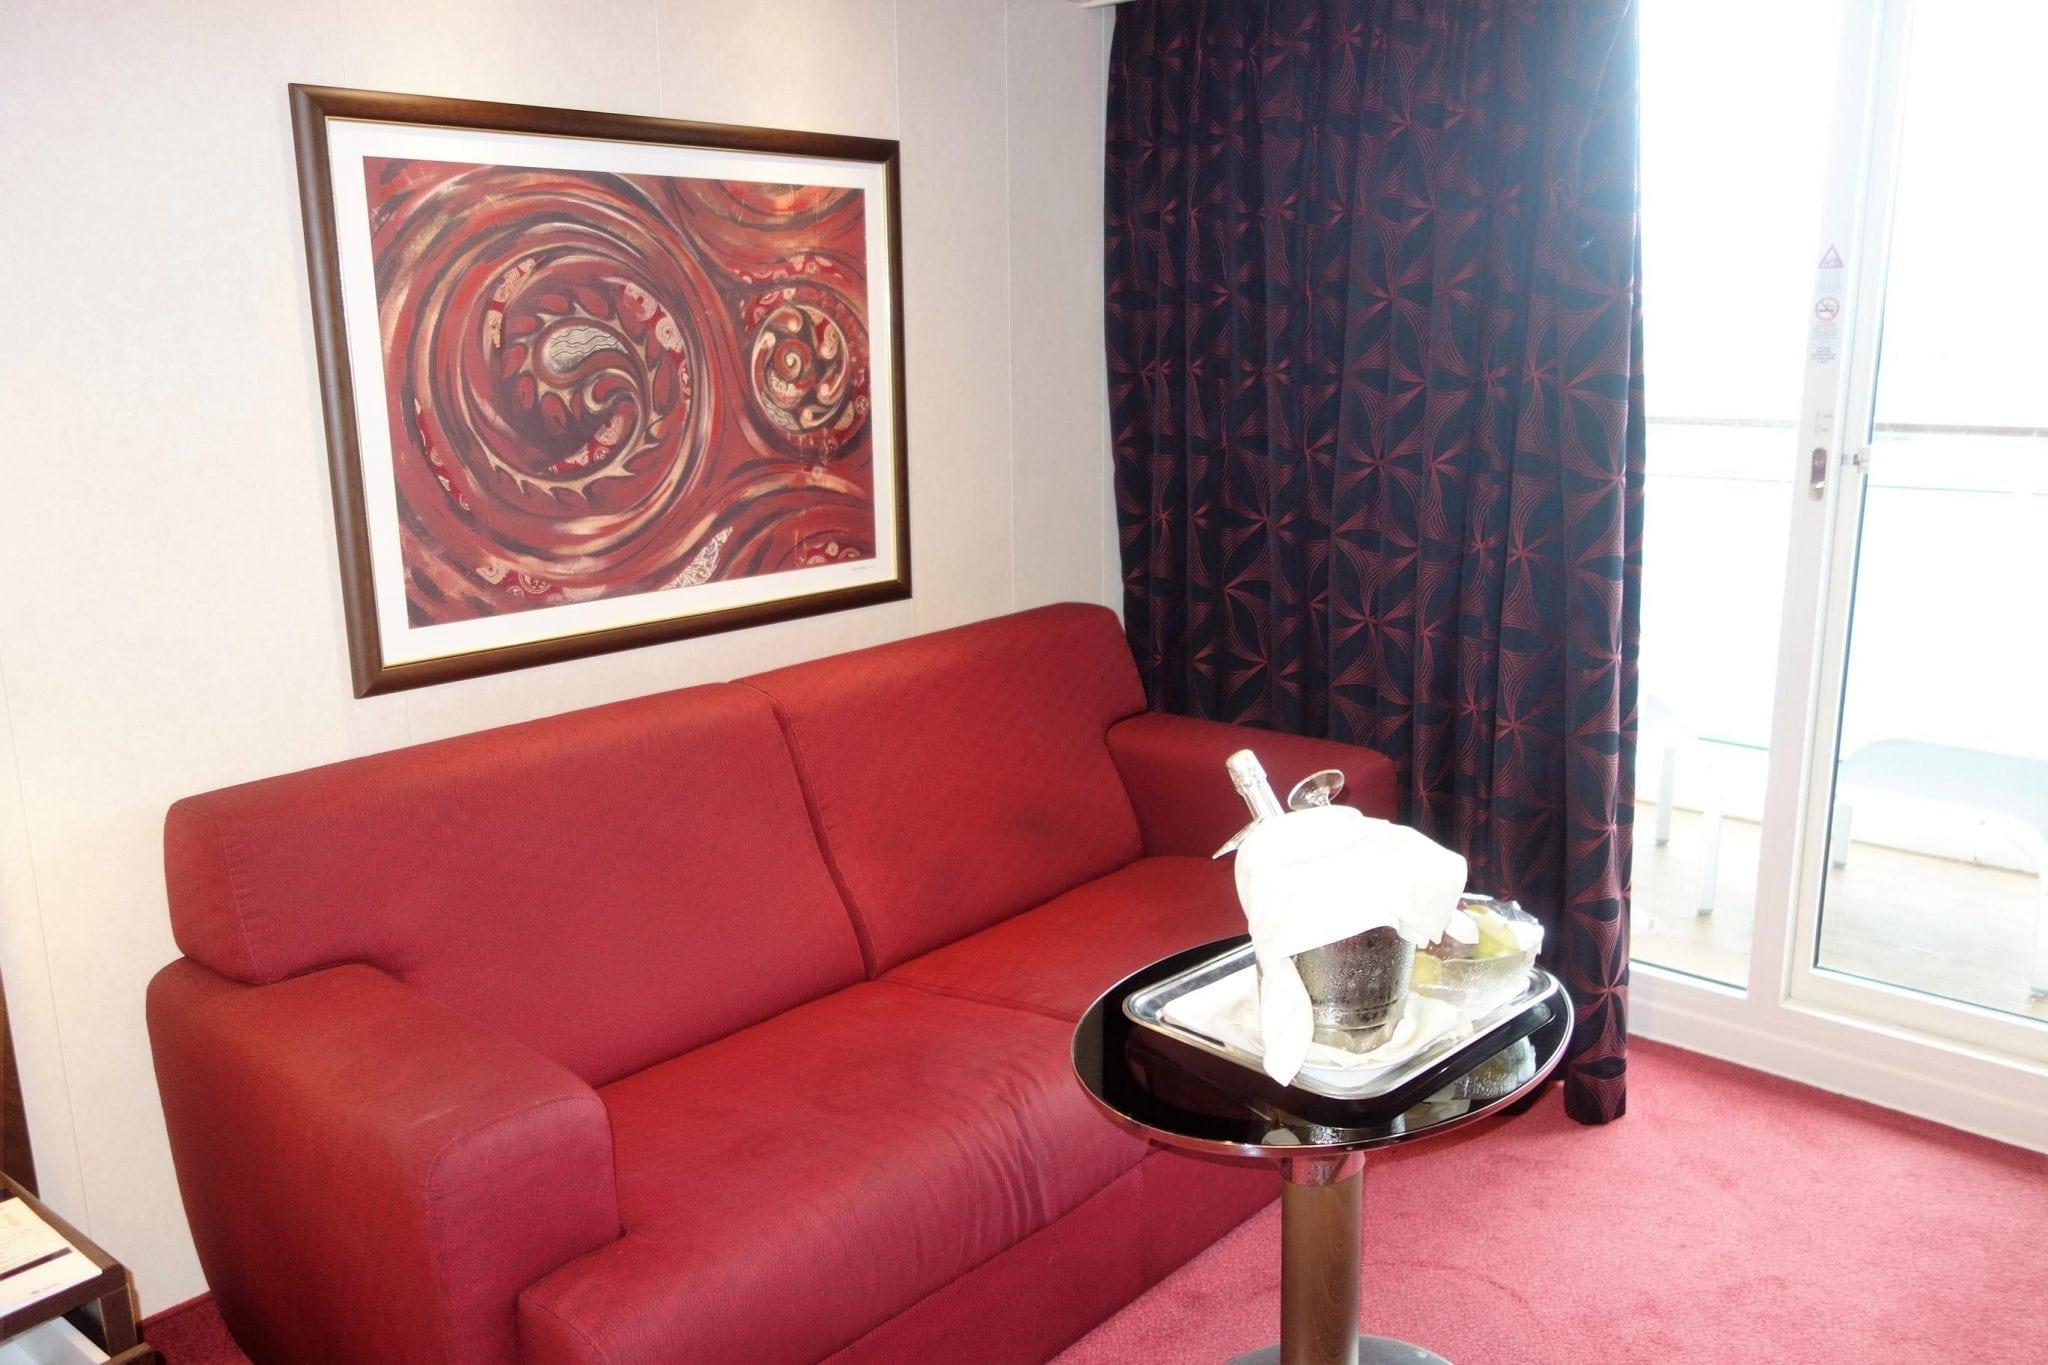 MSC Divina Balcony Room Review